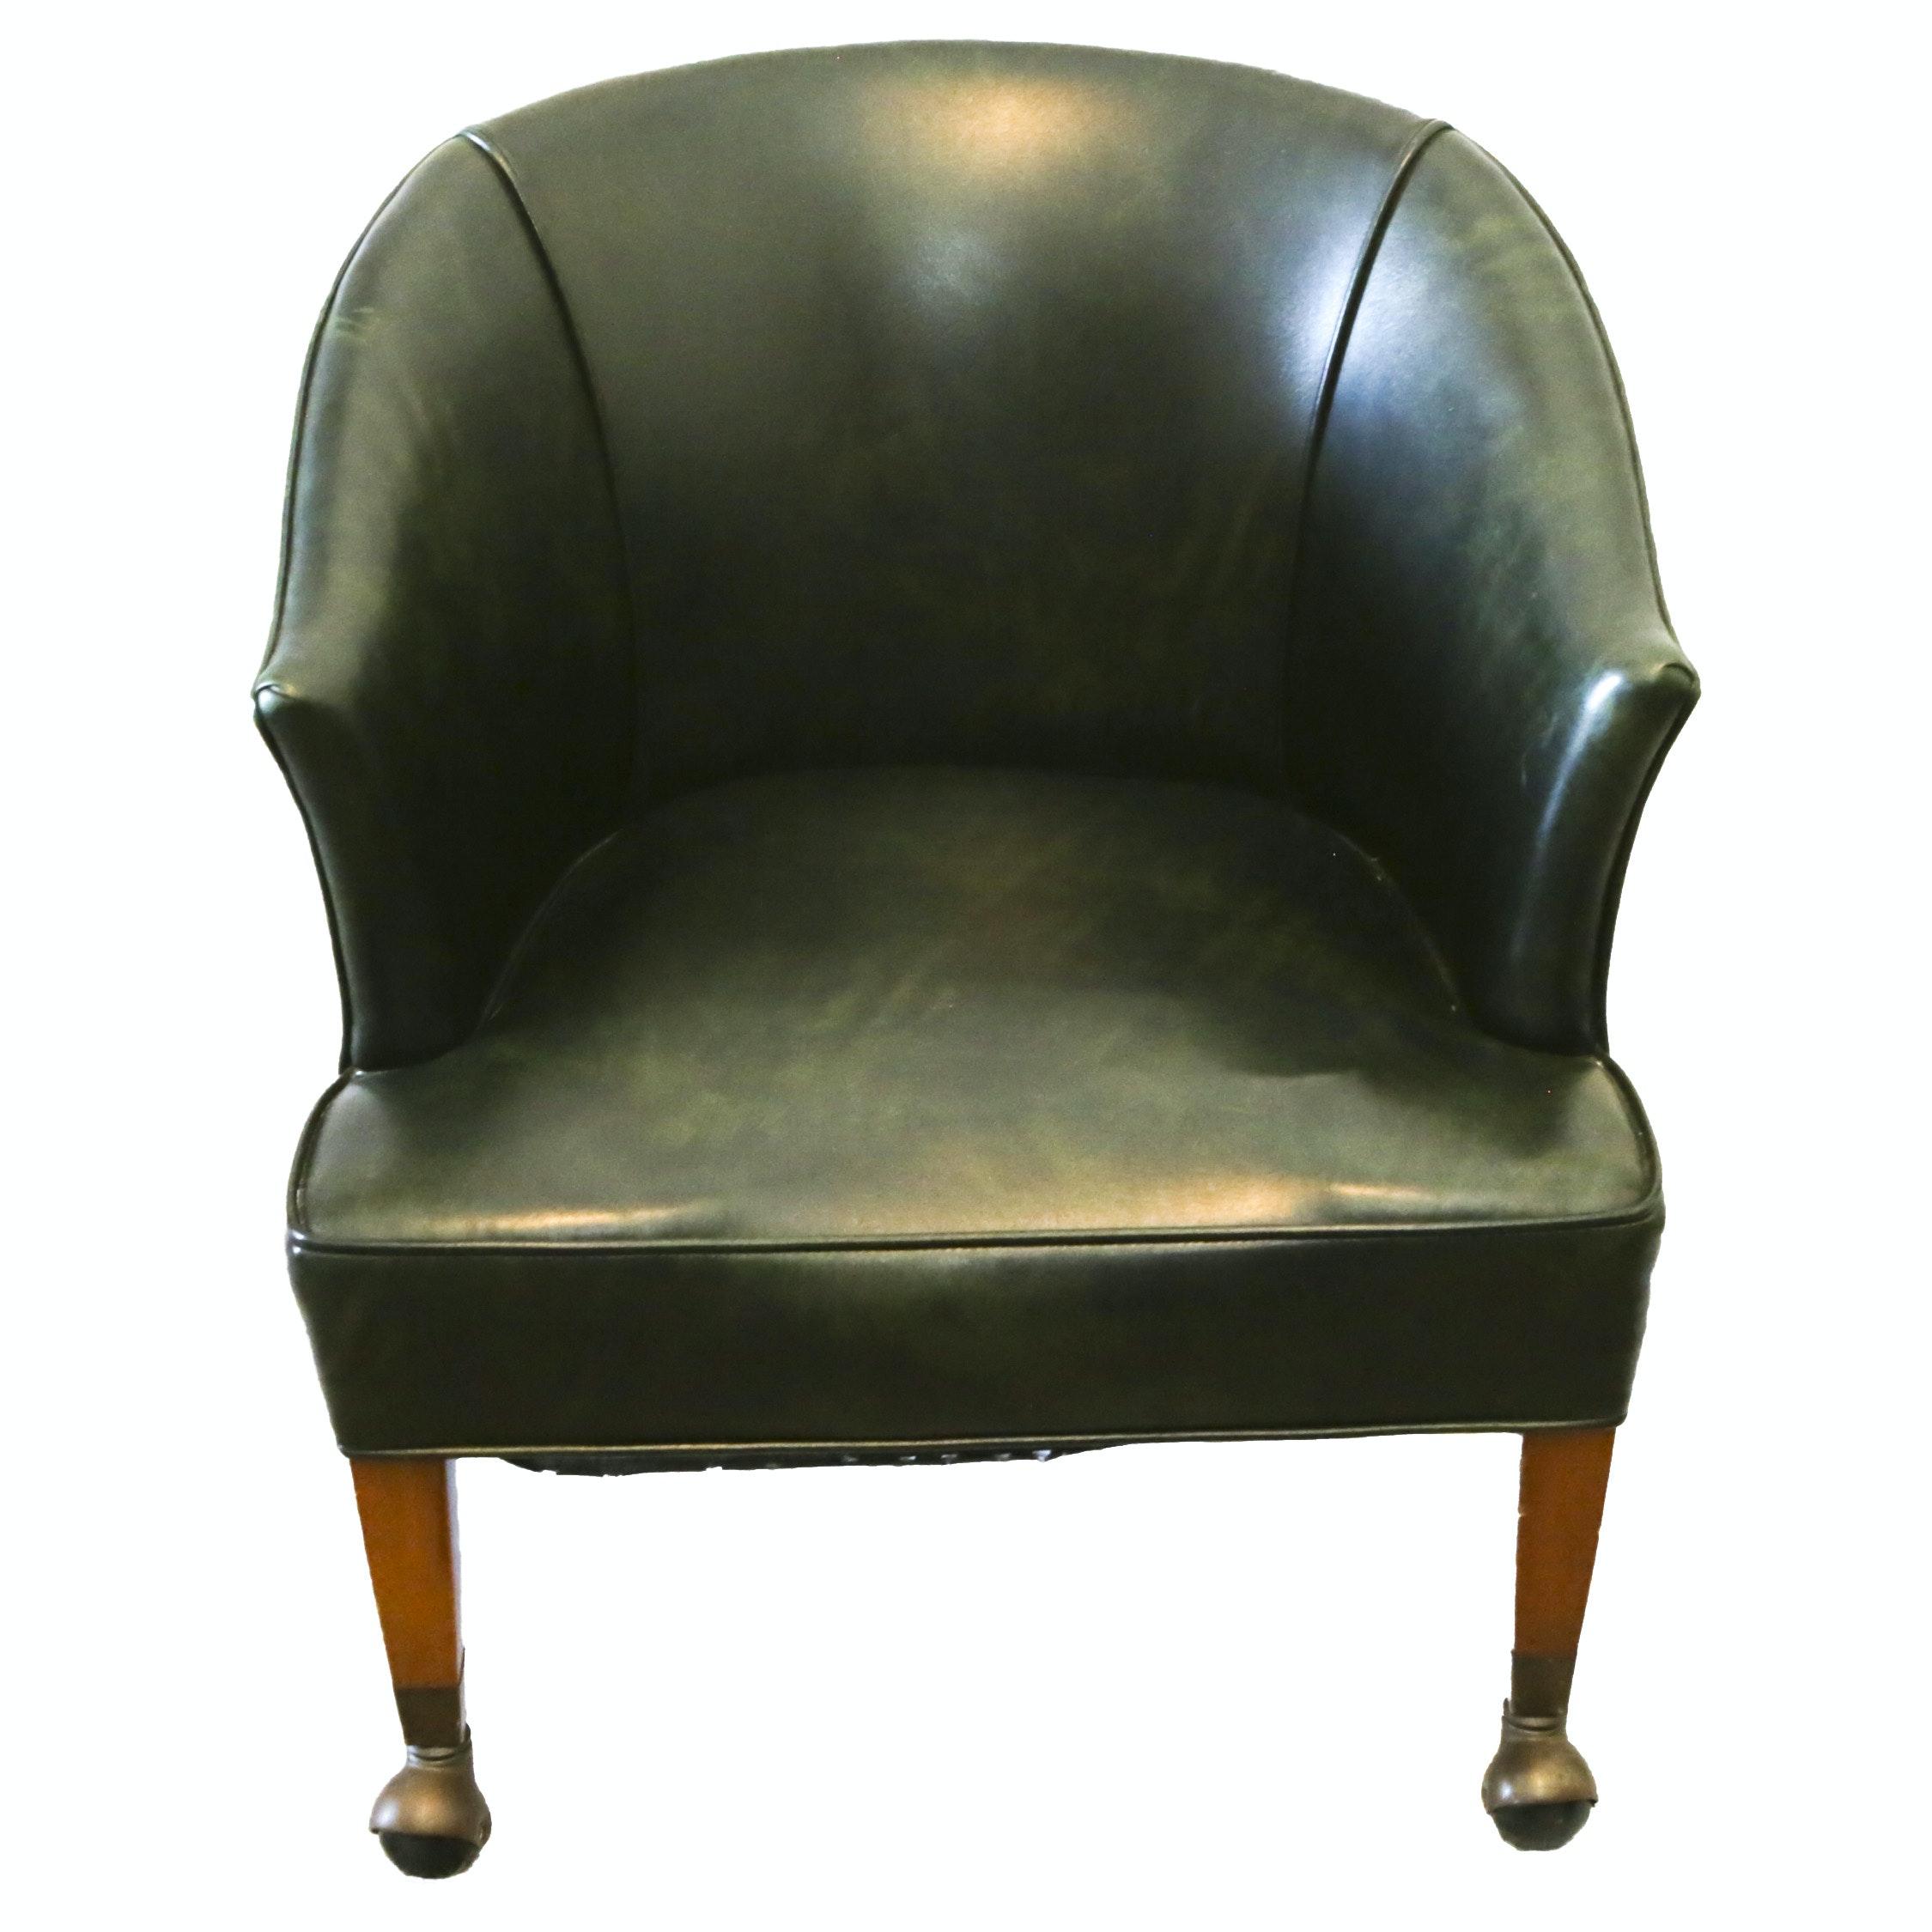 Vintage Green Vinyl Rolling Office Chair